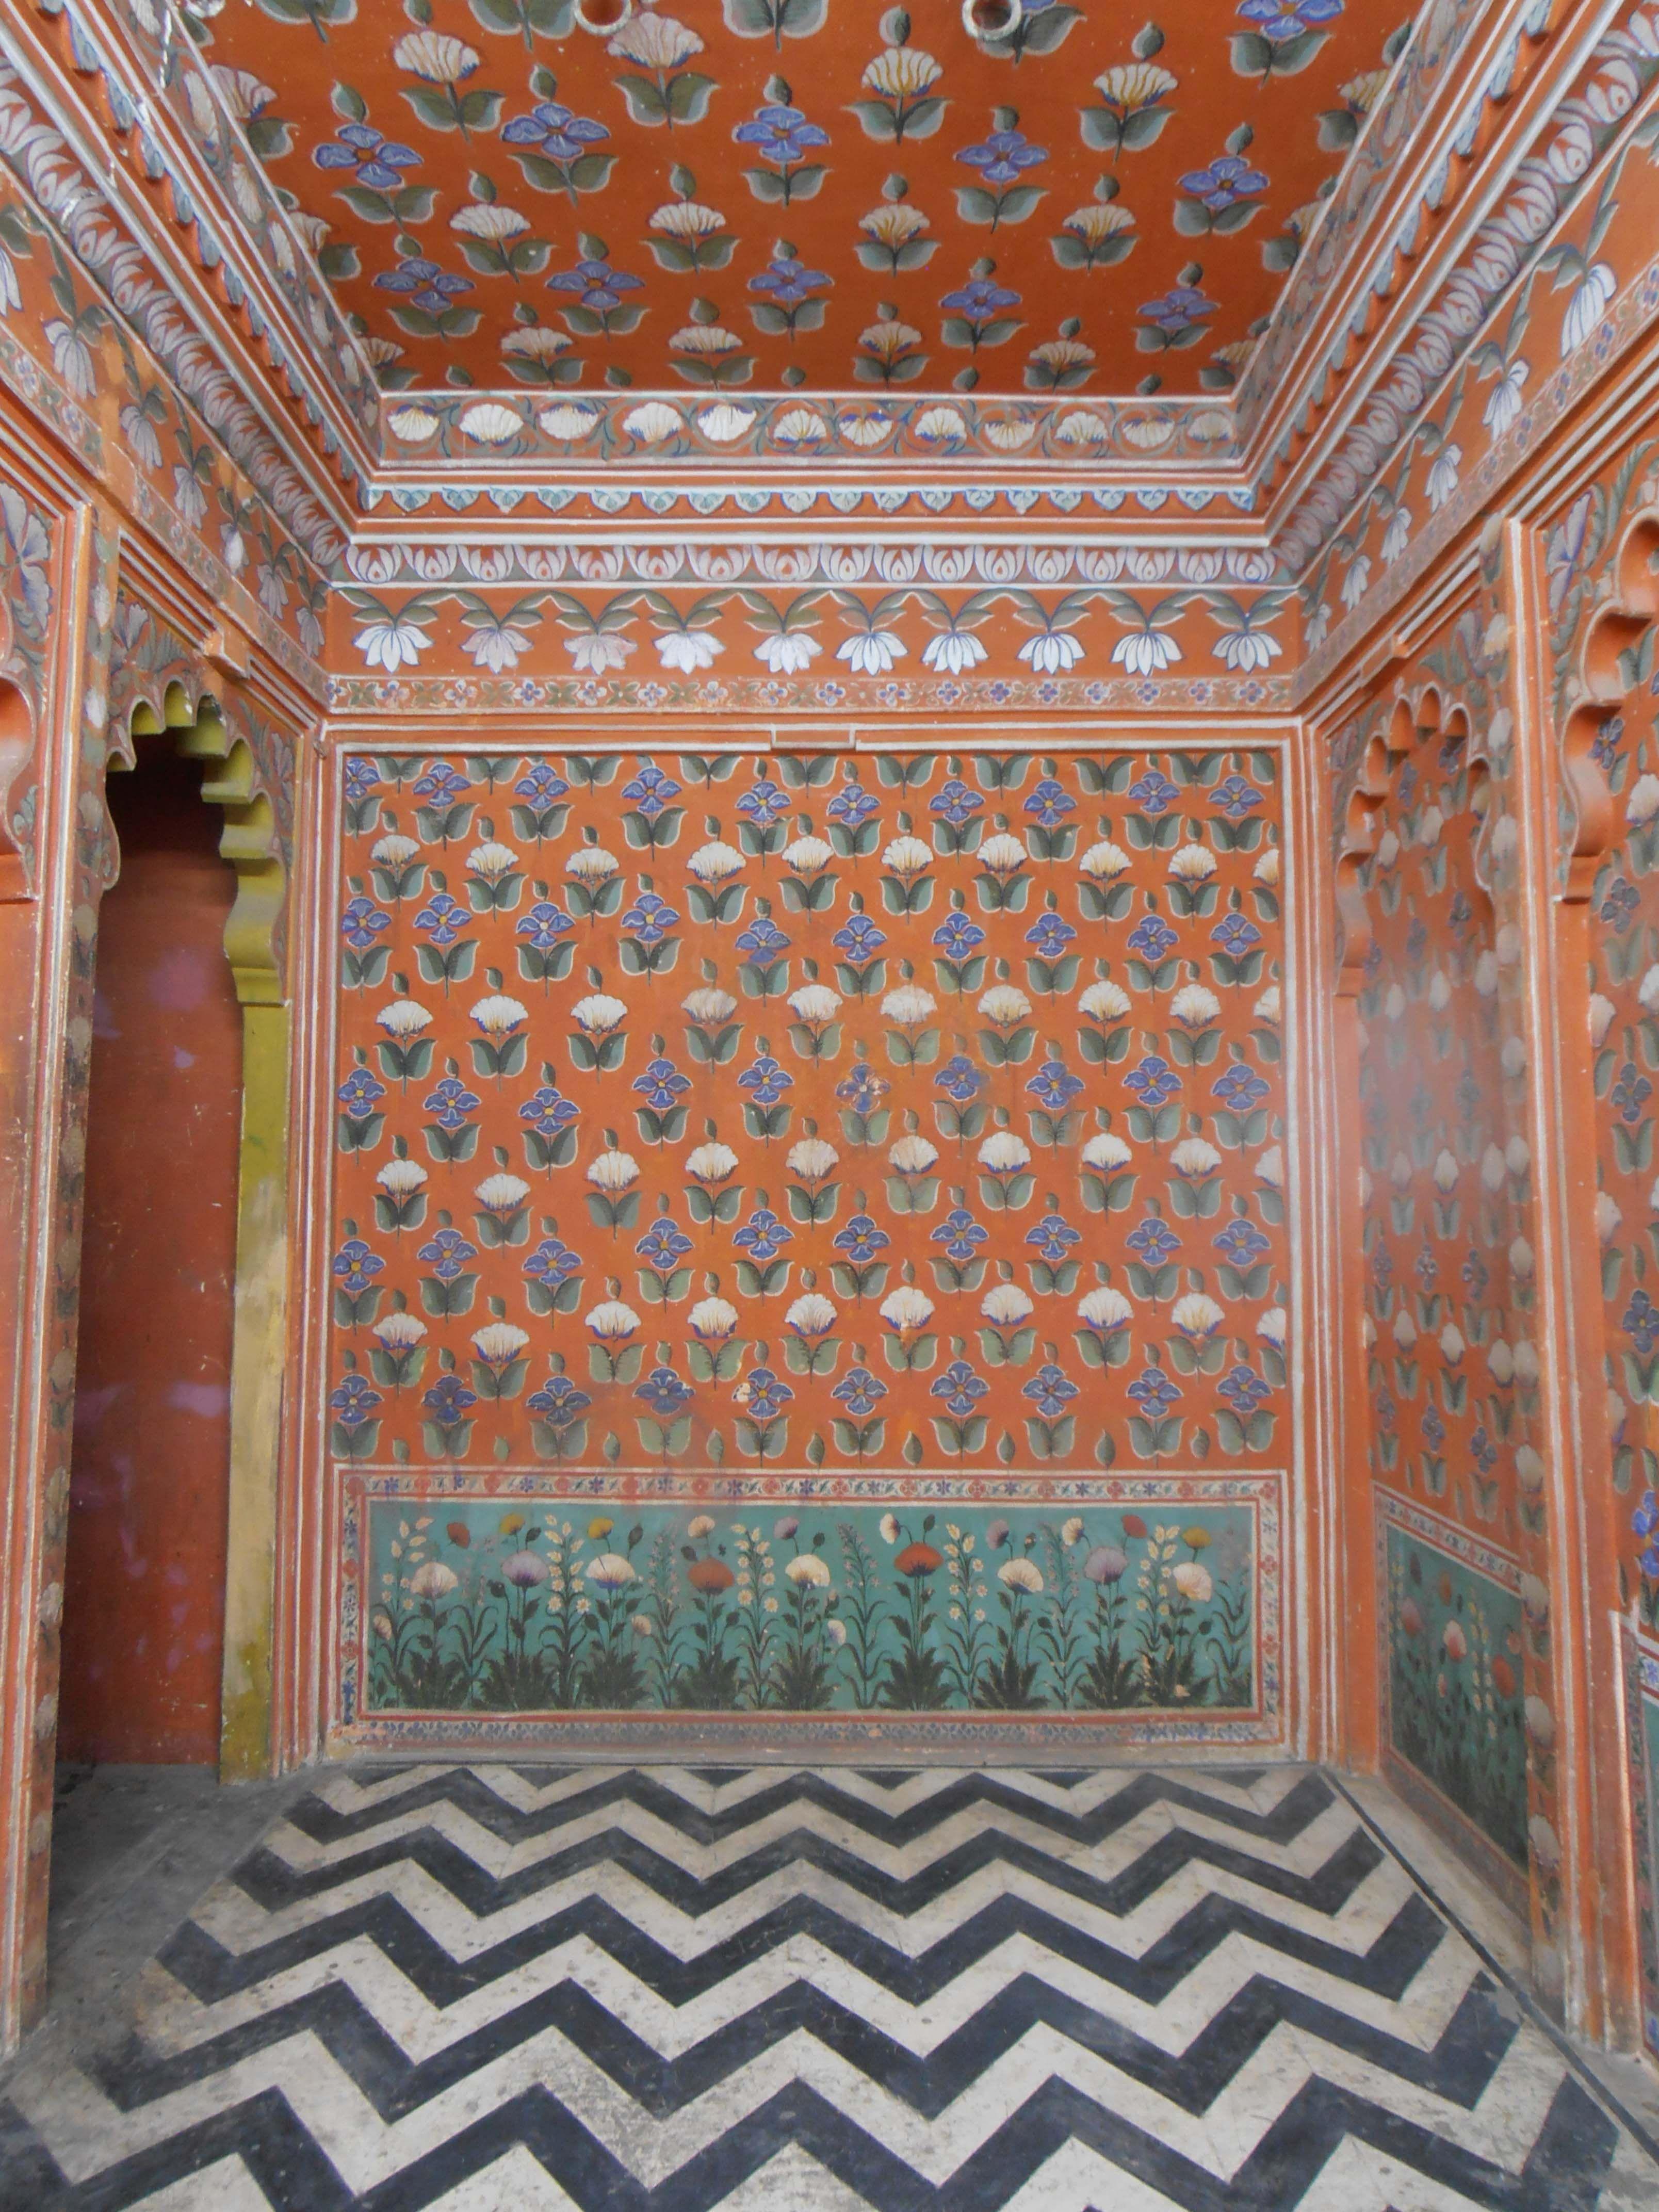 3 bett halb badezimmer ideen lotus room udaipur palace rajasthan india  pattern  pinterest